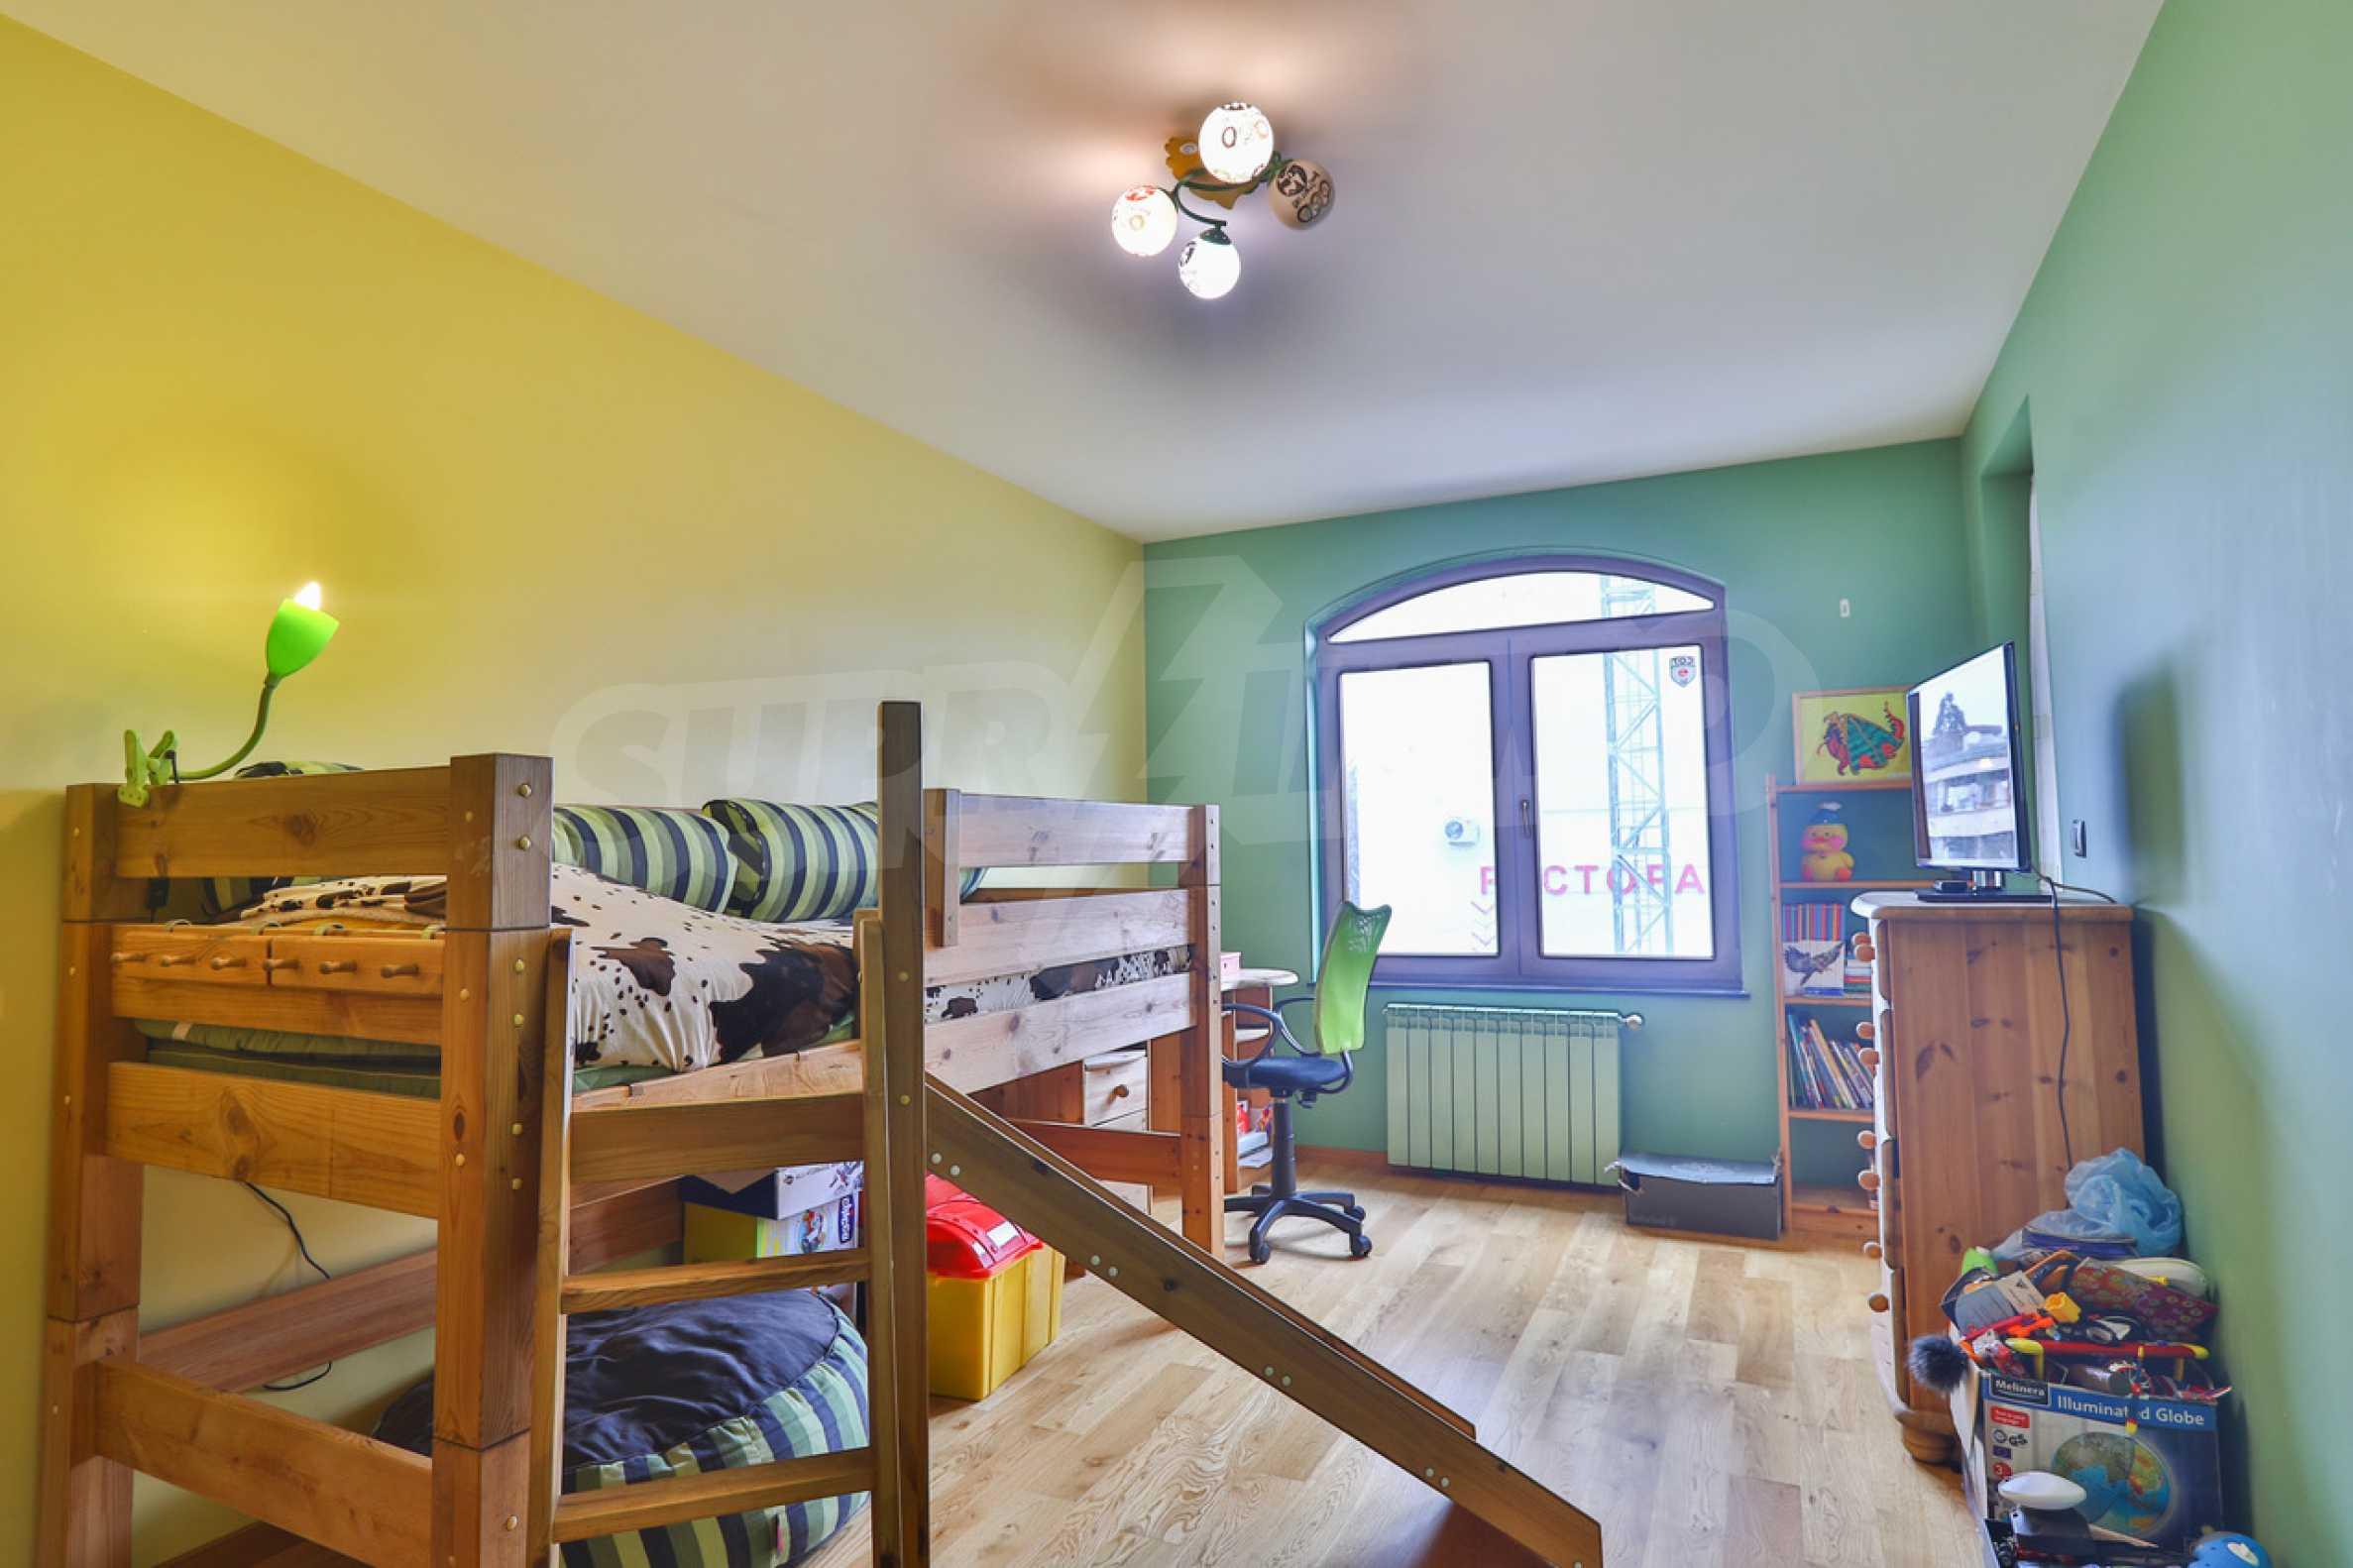 2-bedroom apartment in Sofia 8